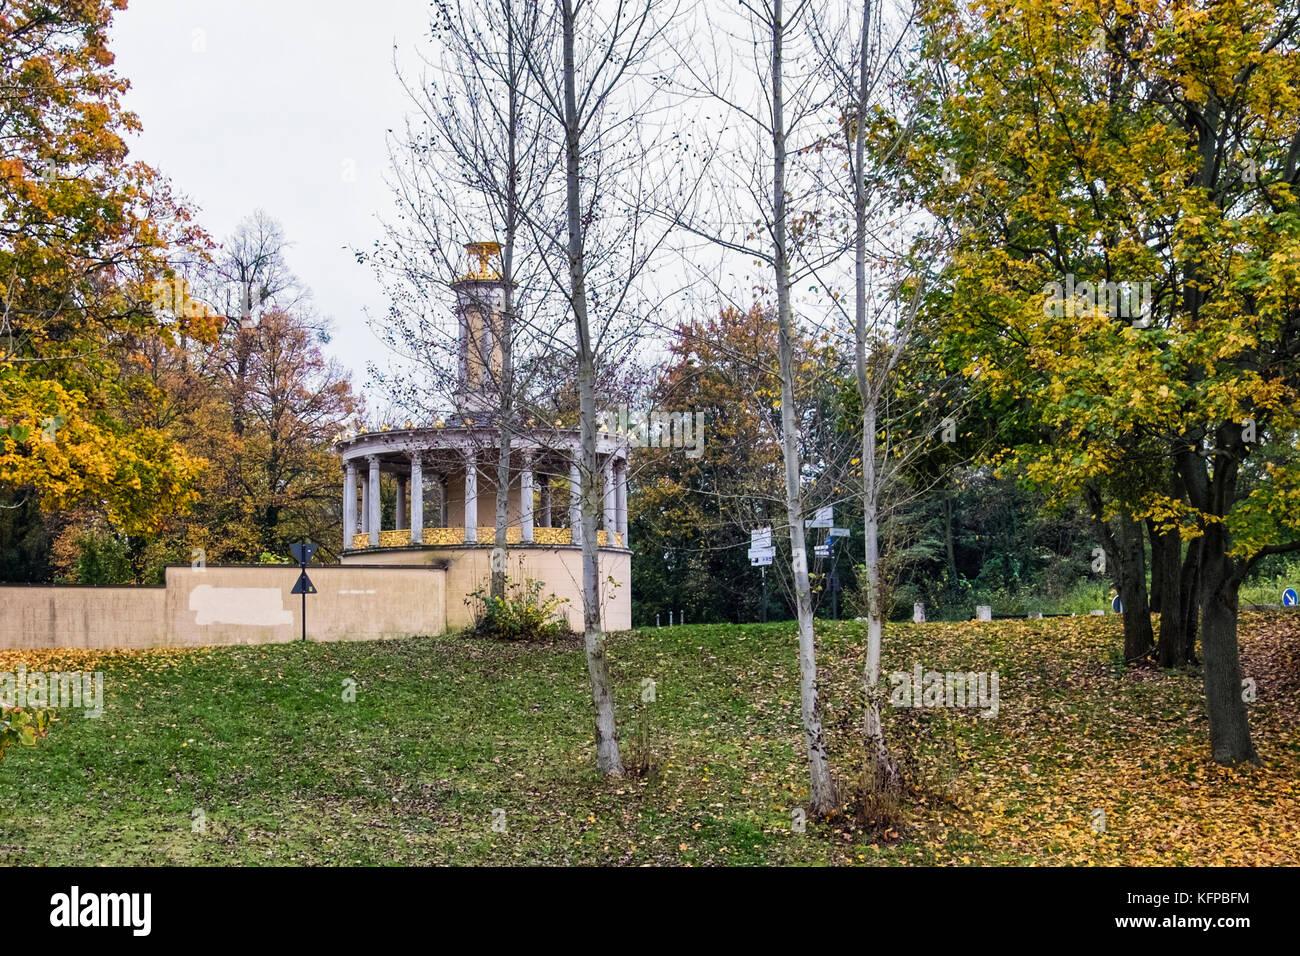 Berlin, Wannsee, Glienicke Park. Rotunda, round summerhouse next to Glienicke Bridge built for Prince Charles of - Stock Image